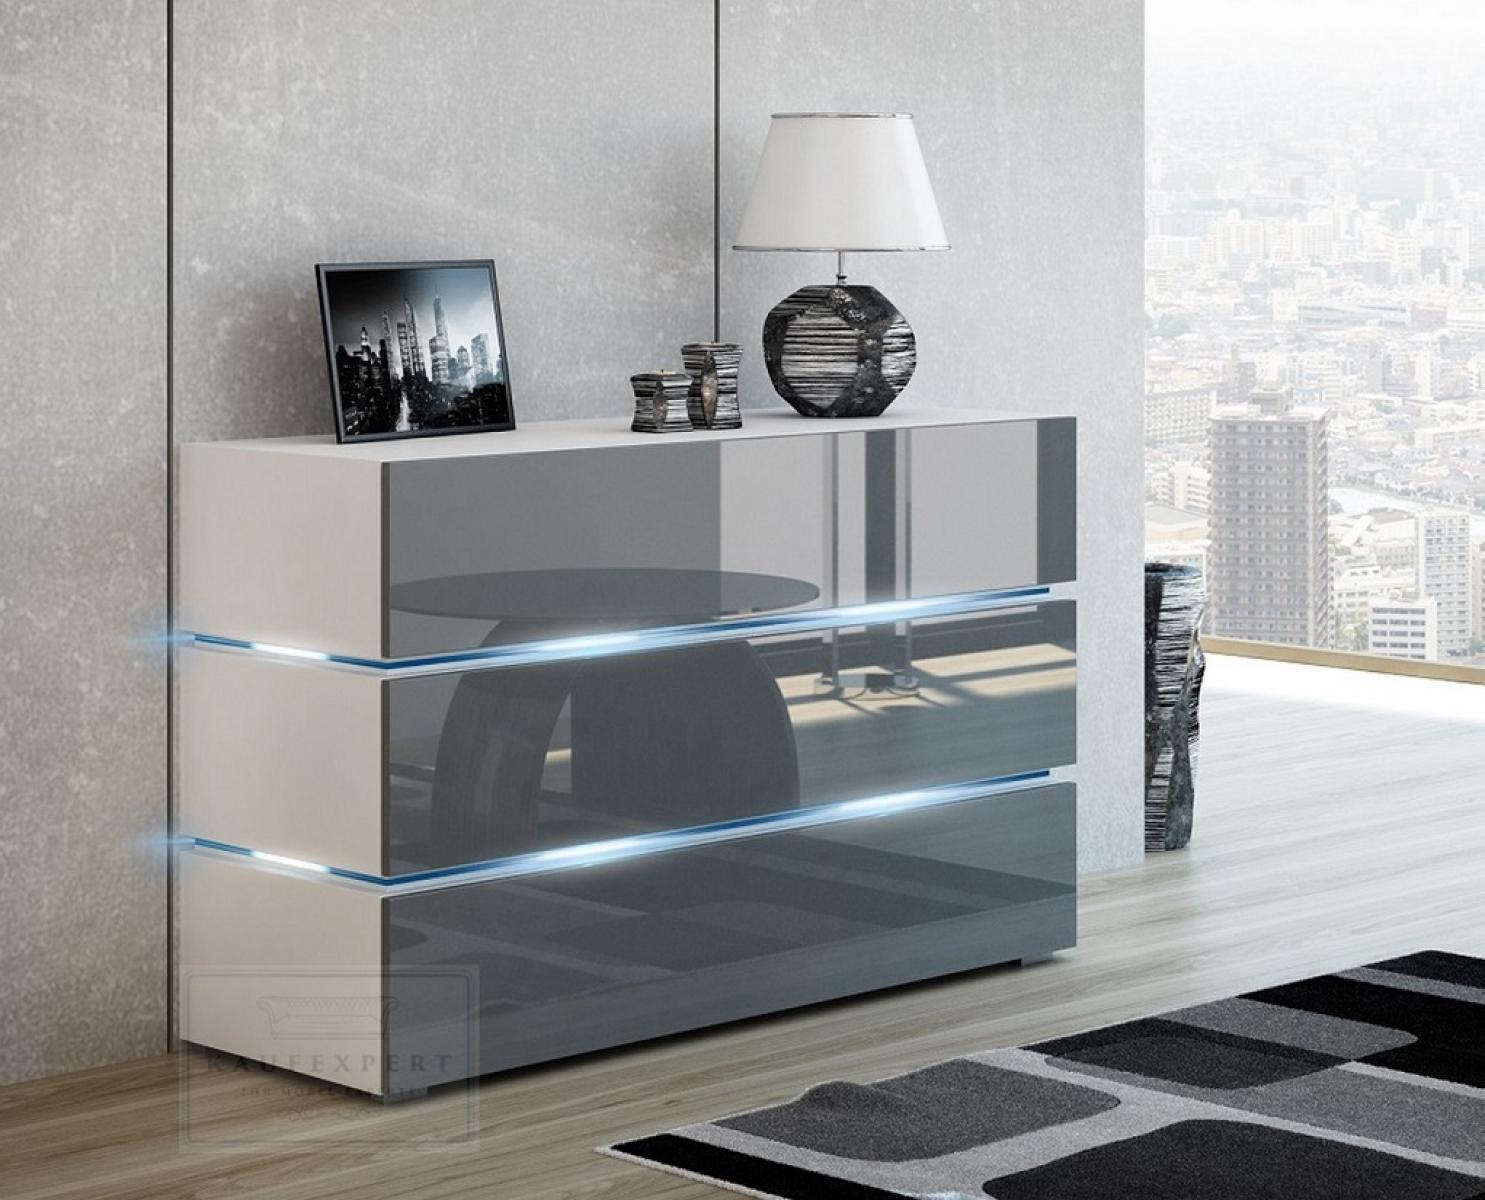 Kaufexpert Kommode Shine Sideboard 120 Cm Grau Hochglanz Weiss Led